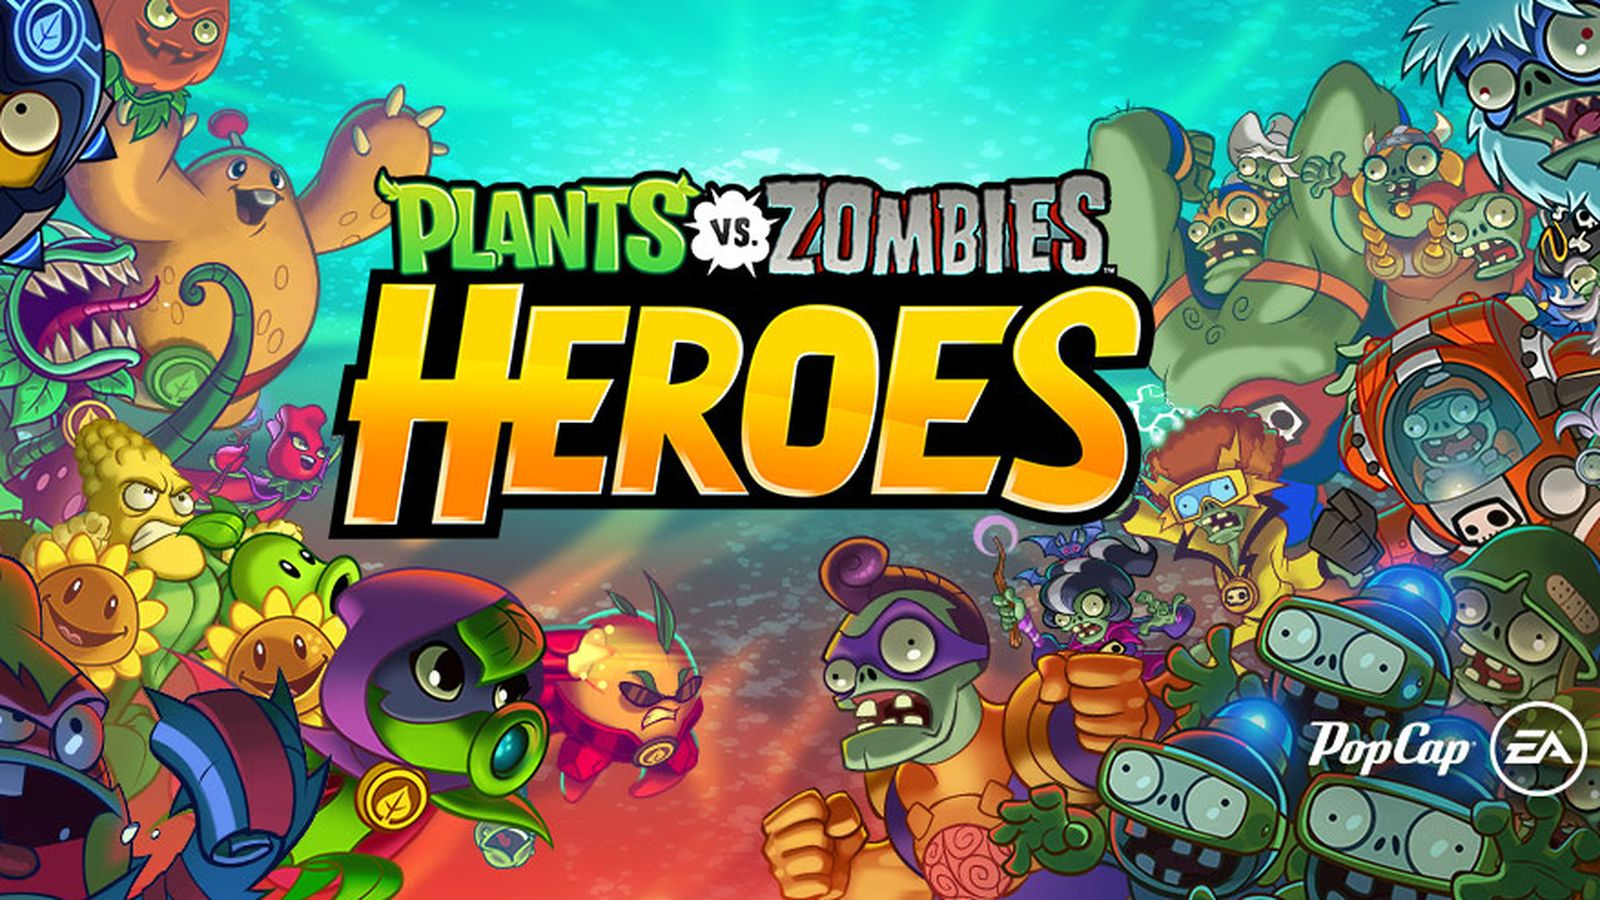 popcap_games_announces_plants_vs-_zombies_heroes_for_mobile-0-0